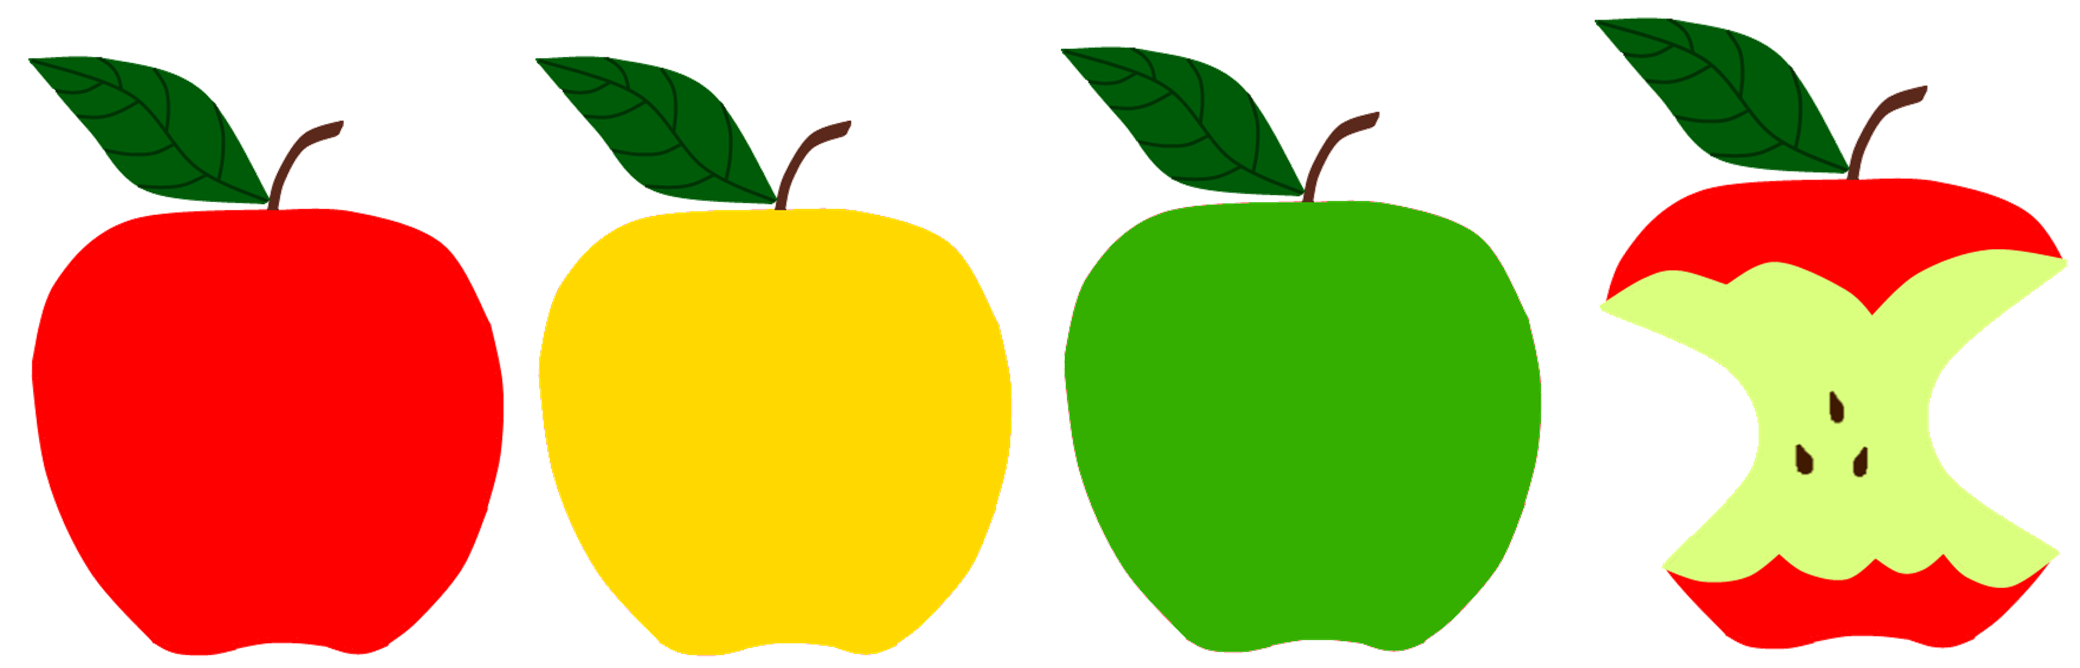 2080x668 Apples Sunflower Storytime